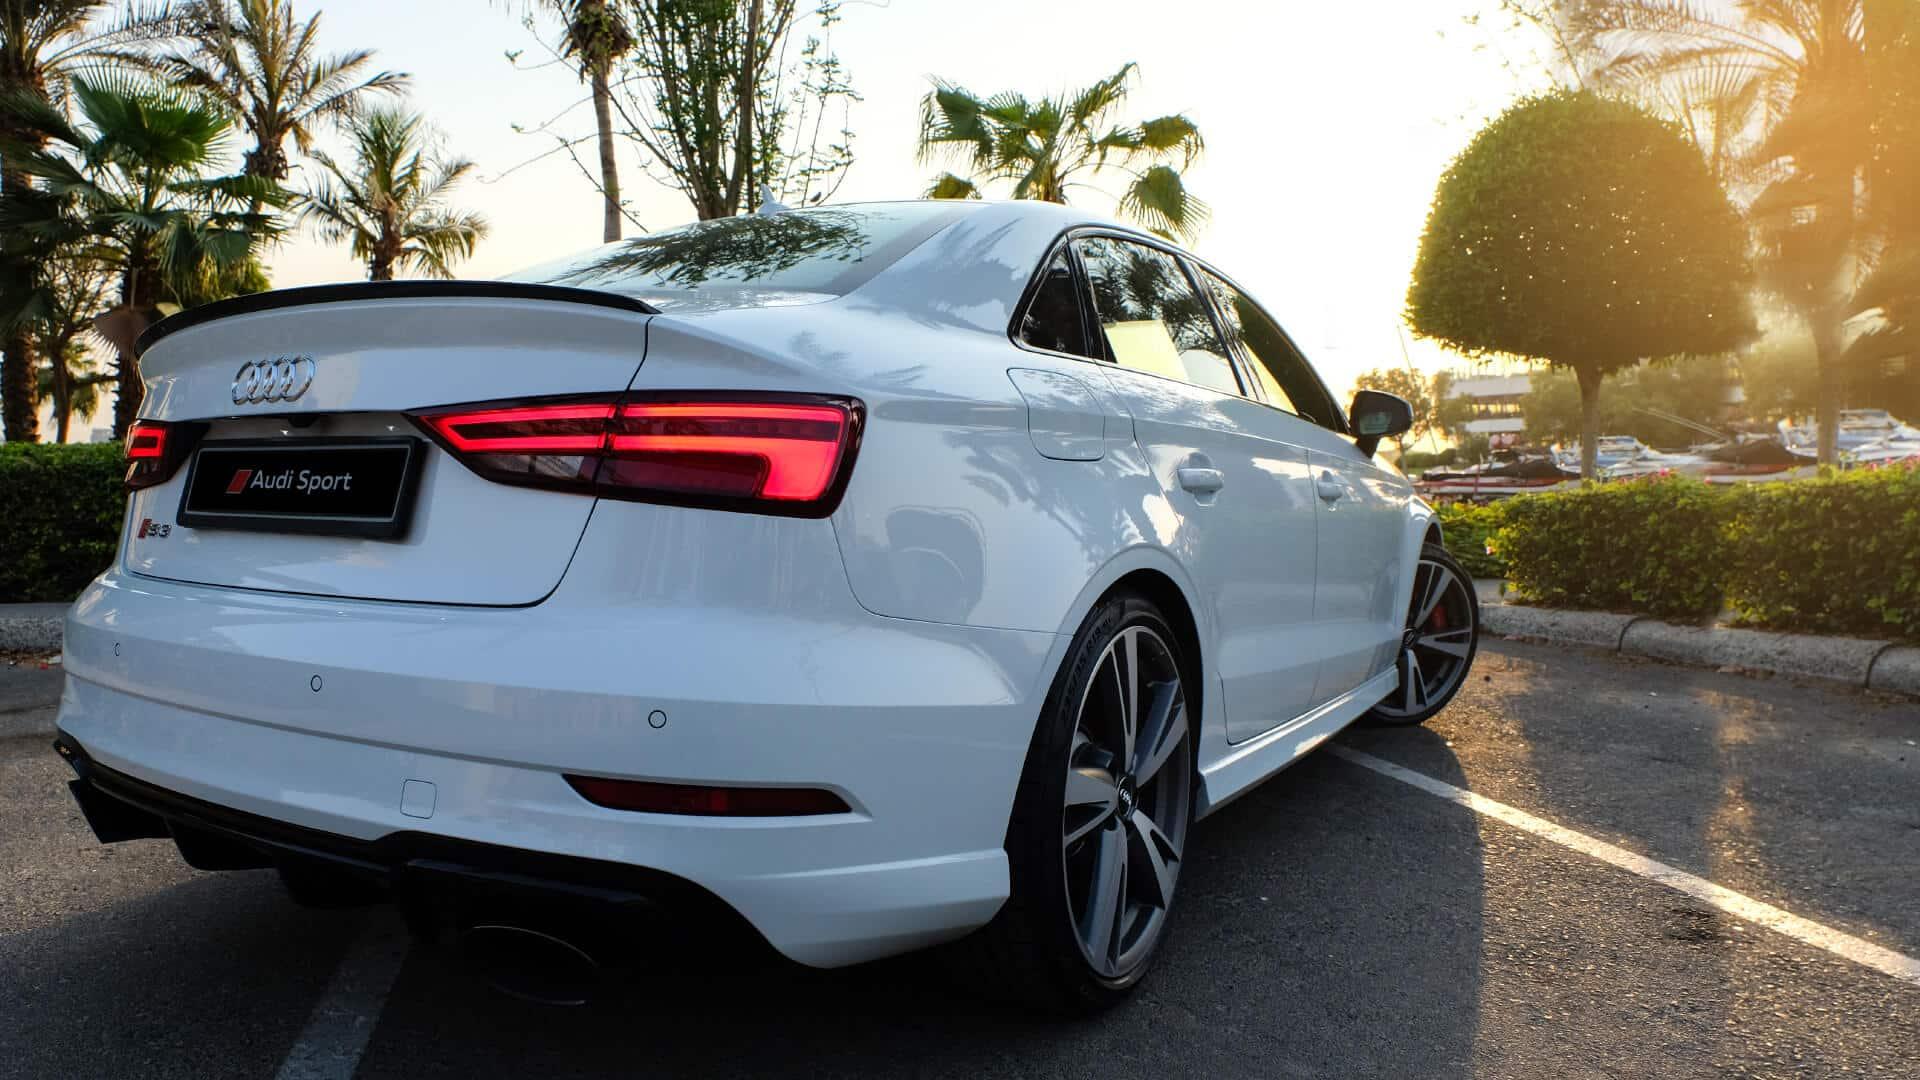 2020 Audi Rs 3 Register Your Interest Today Audi Bahrain